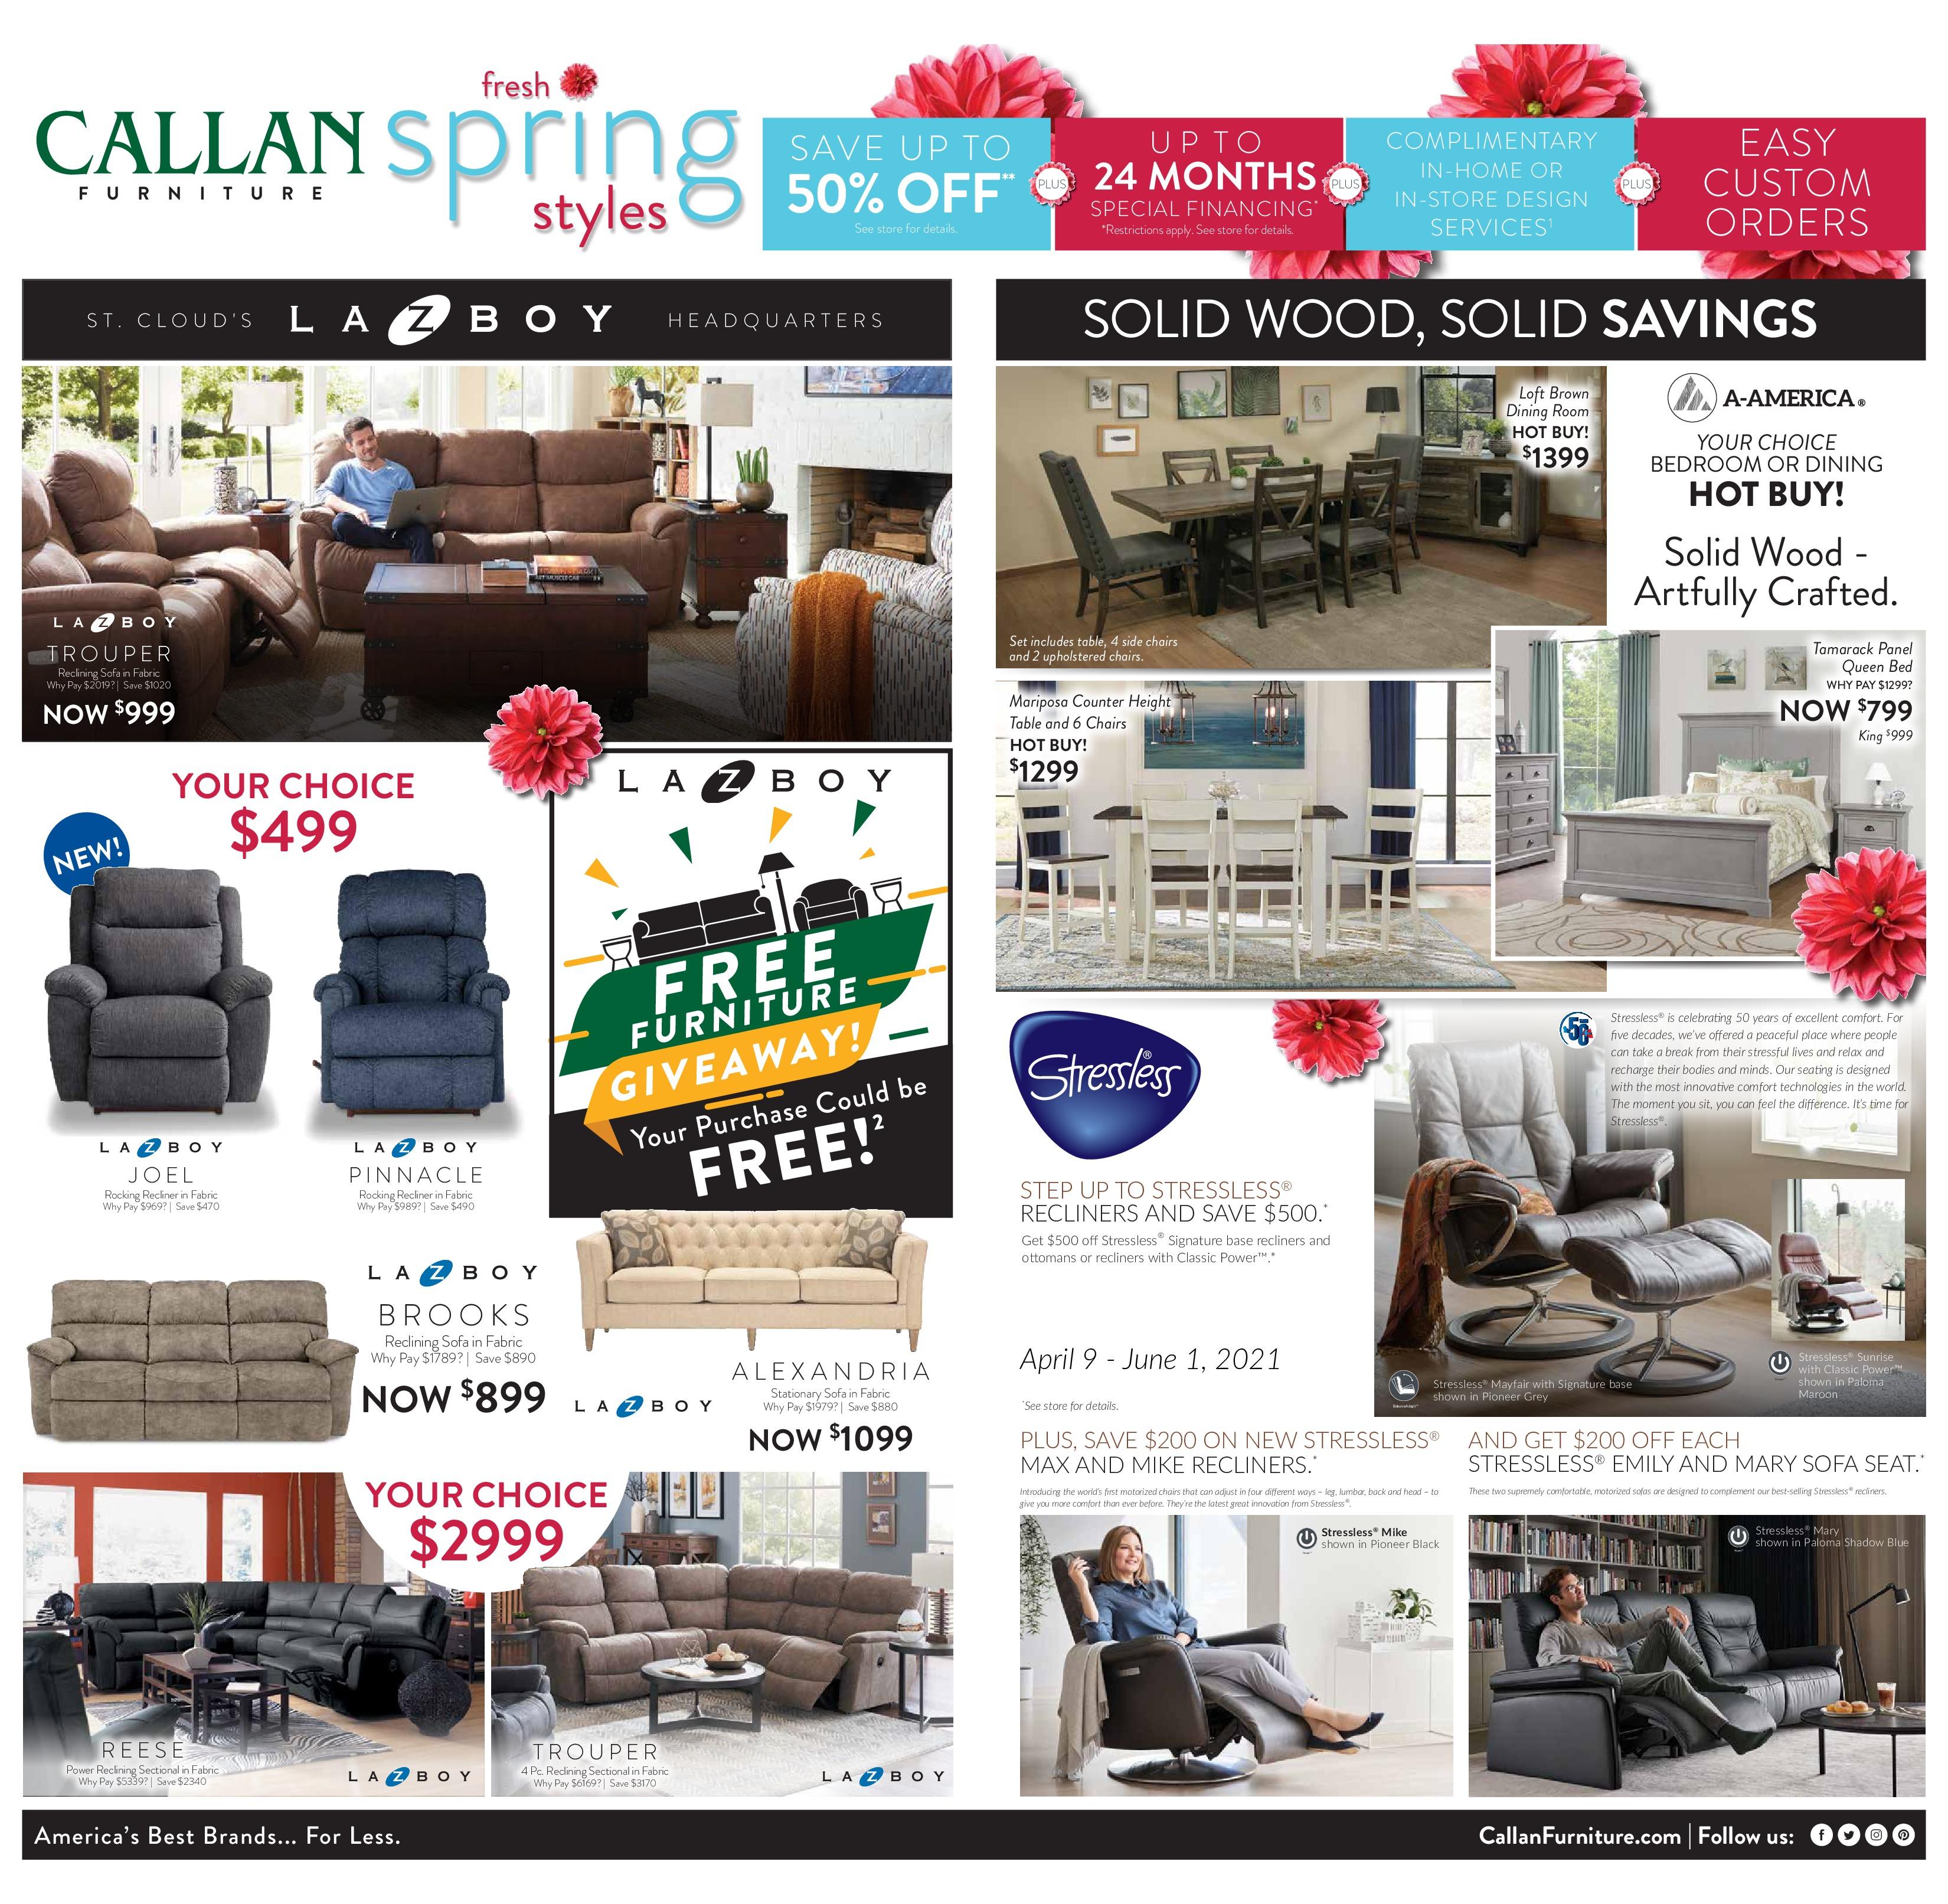 CALL-9021-2142-SpringStyles-WebSpecial